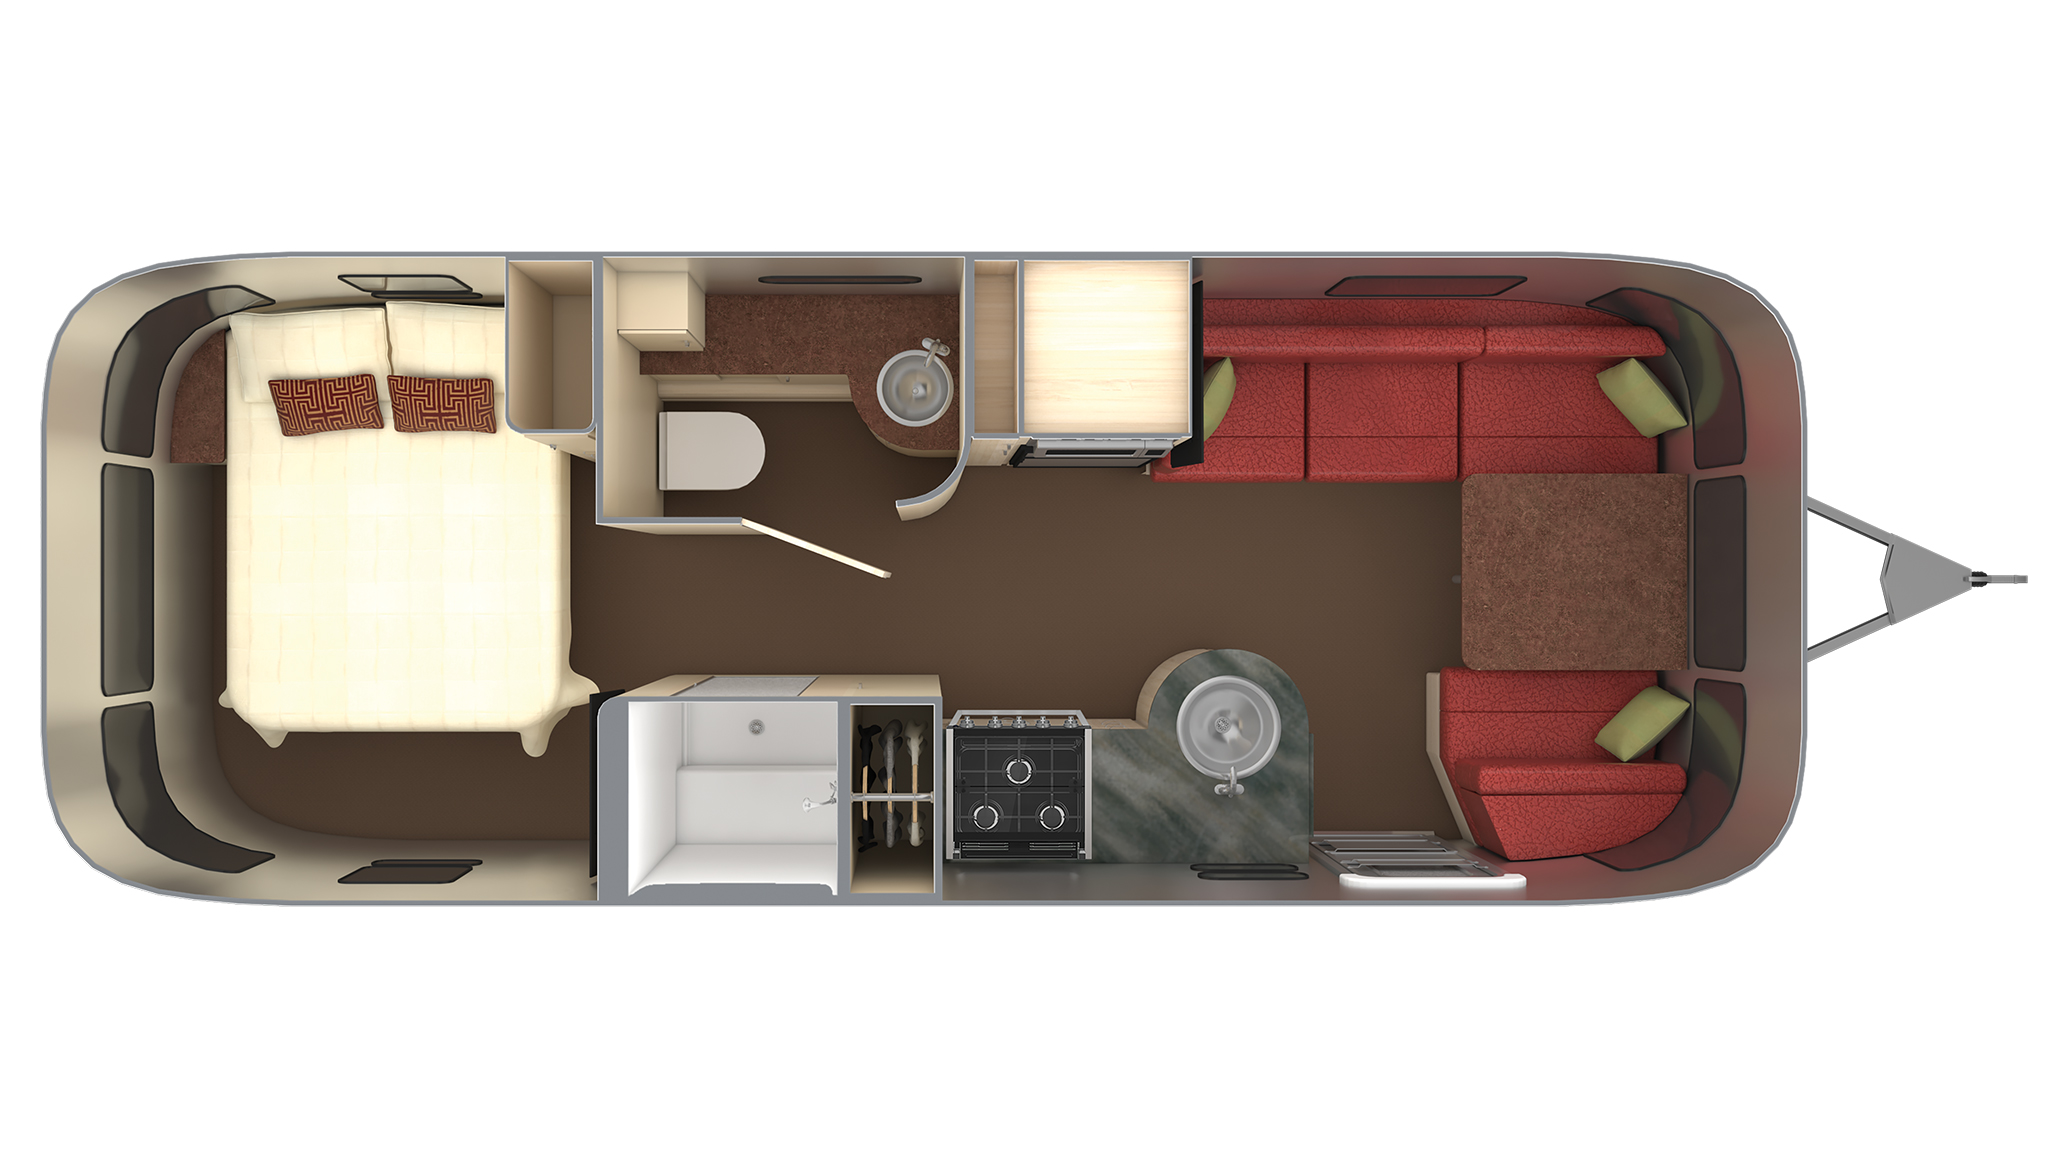 Airstream-Travel-Trailer-Floor-Plan-Naming-25RB